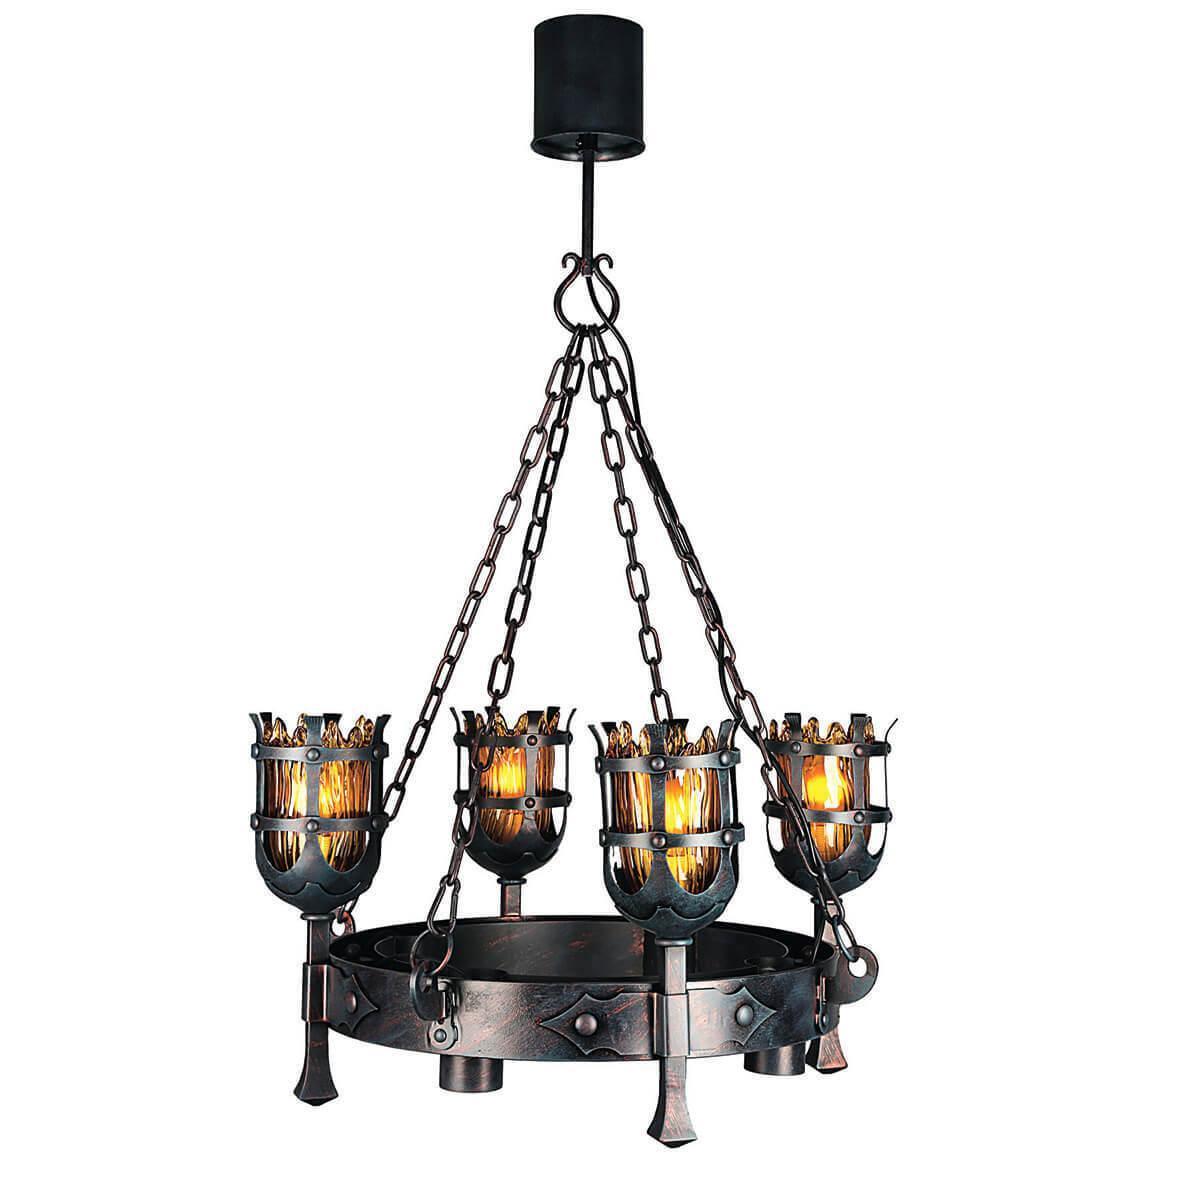 Подвесной светильник Omnilux OML-50003-08, E27, 60 Вт